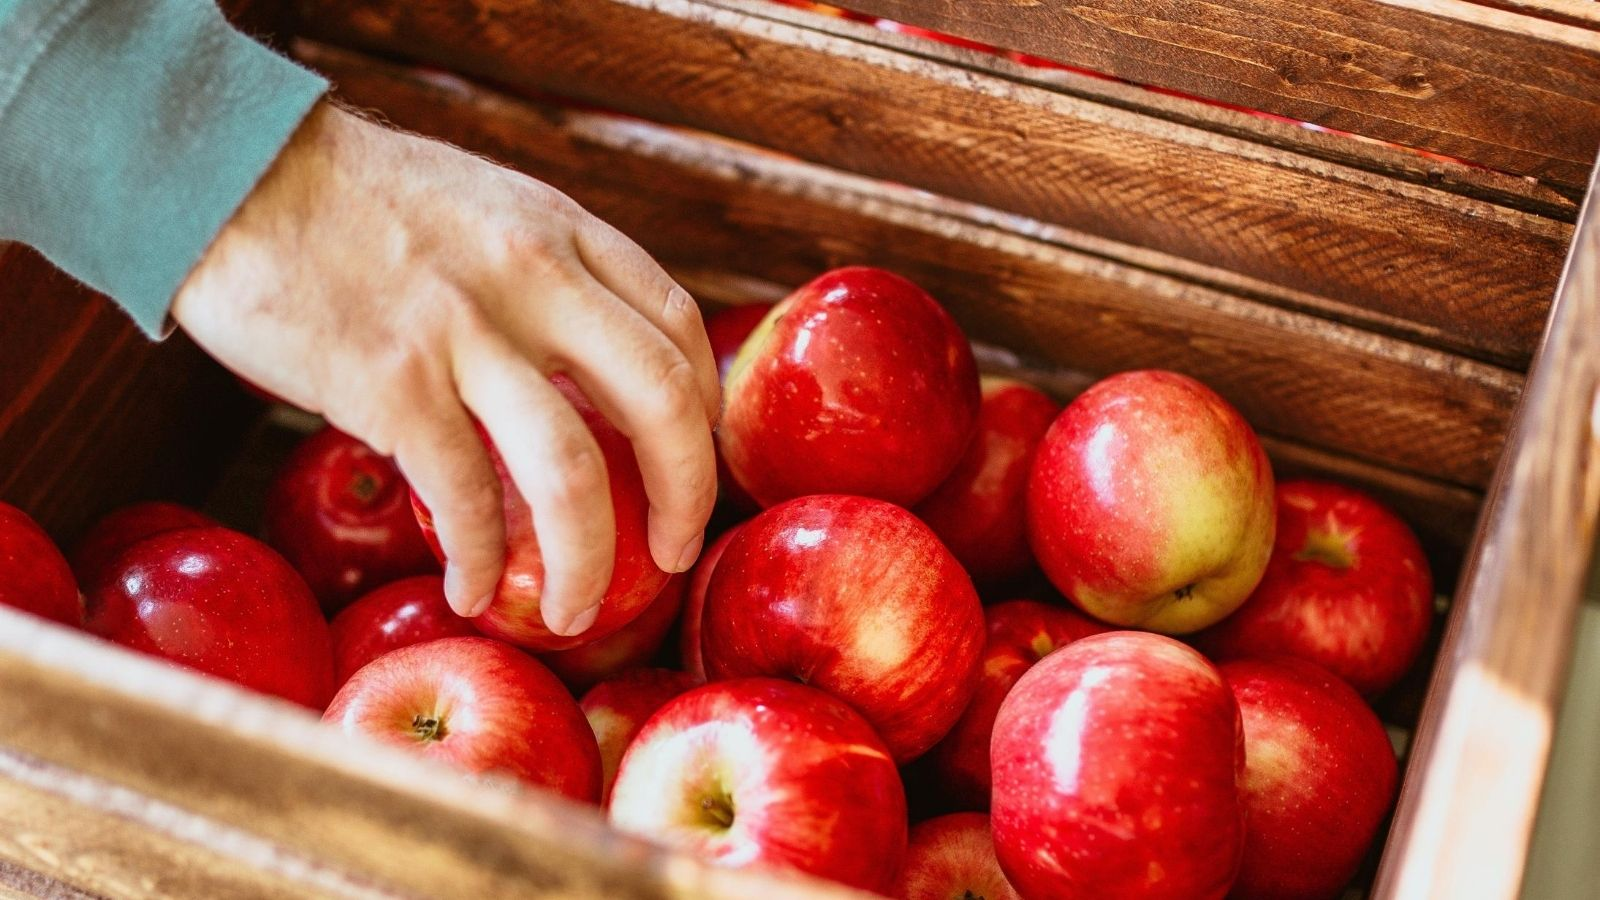 Jabłko nowym symbolem Polski? Promocja mediarun jablka